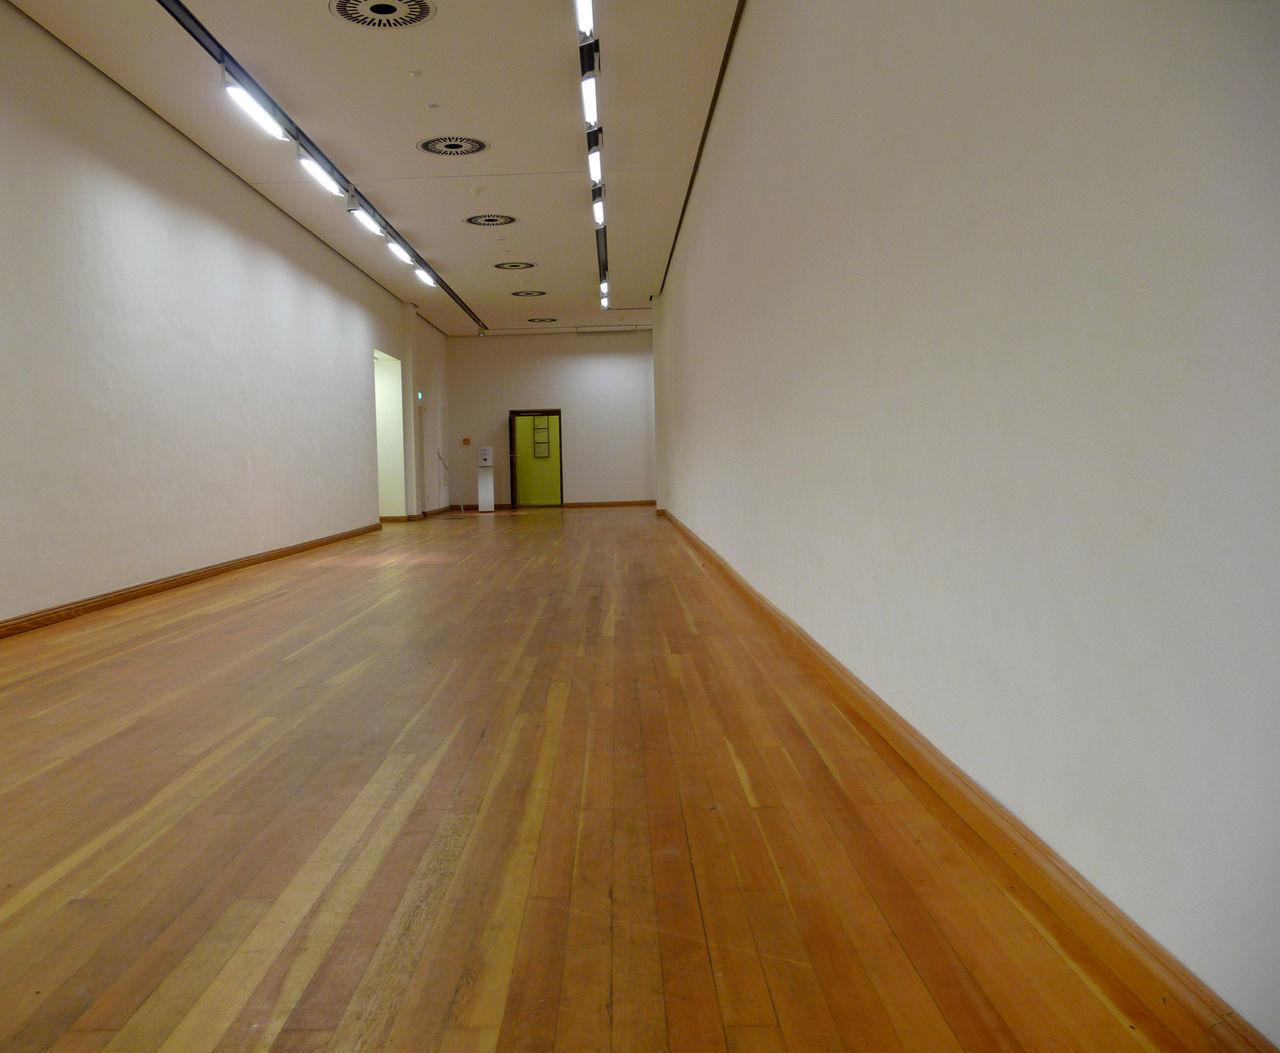 flooring, indoors, empty, hardwood floor, no people, illuminated, architecture